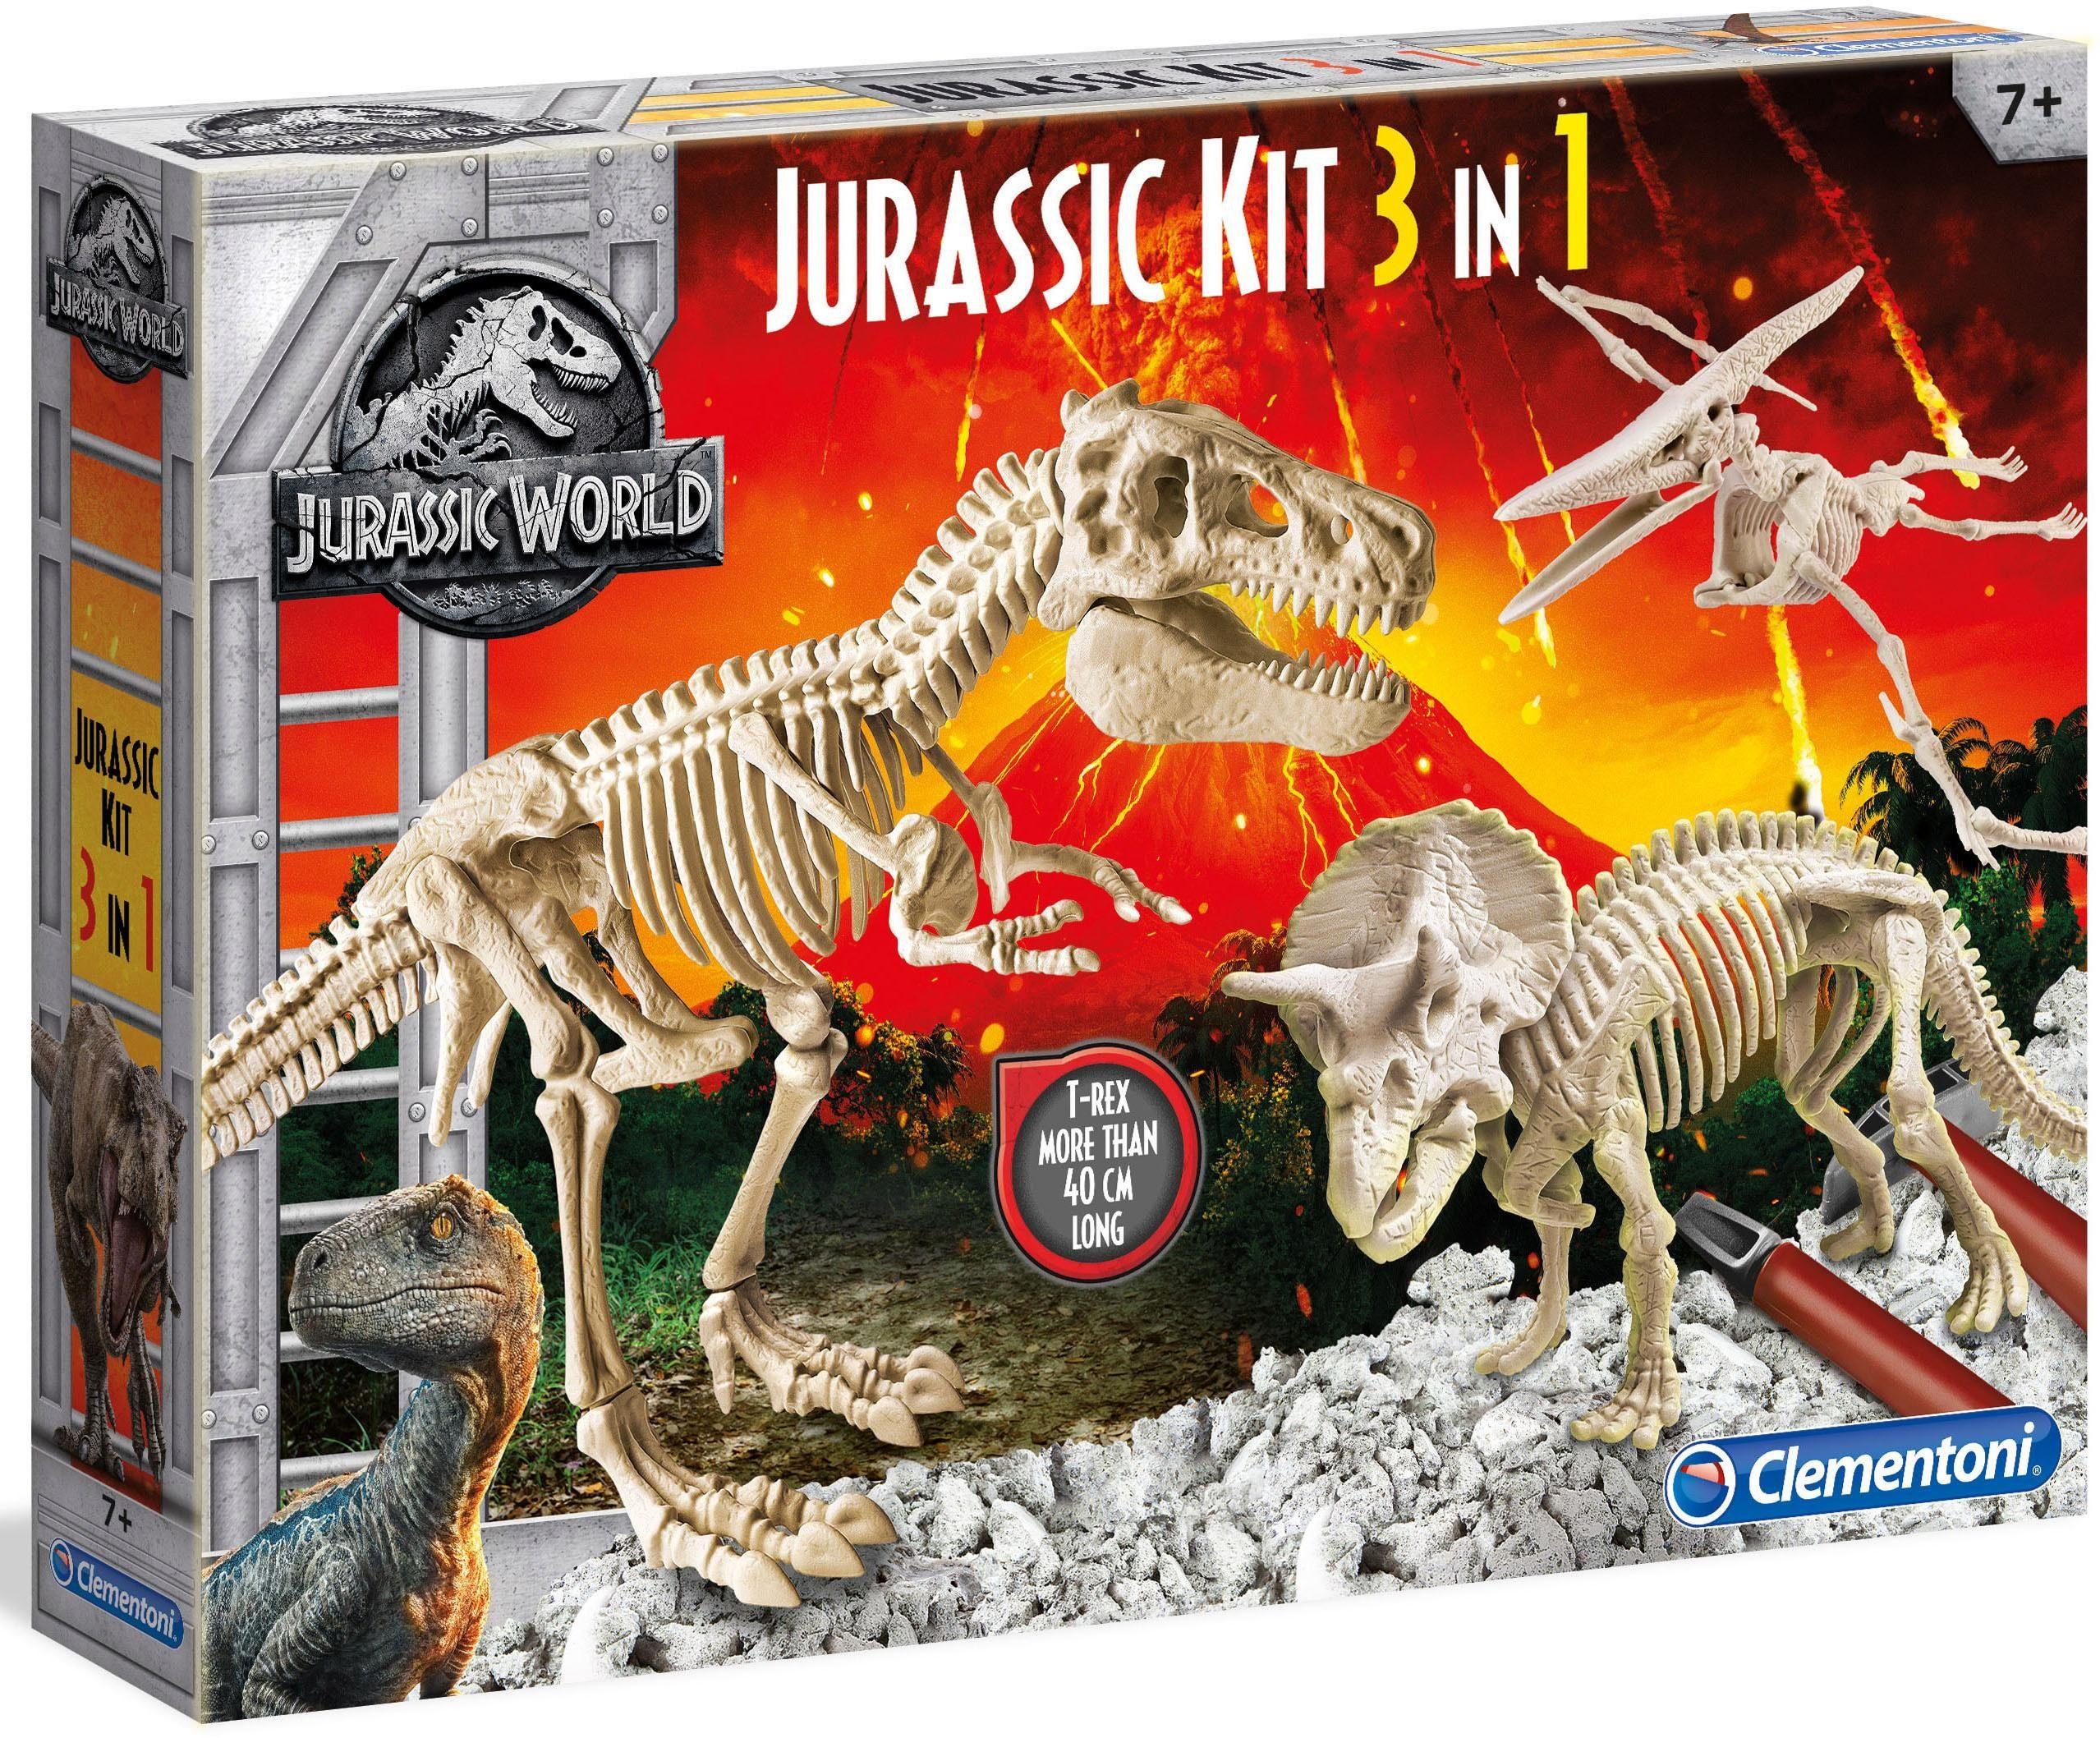 Clementoni 3-in-1 Experimentierset, »Jurassic World, Ausgrabungsset T-Rex+Pteranodon+Triceratops«